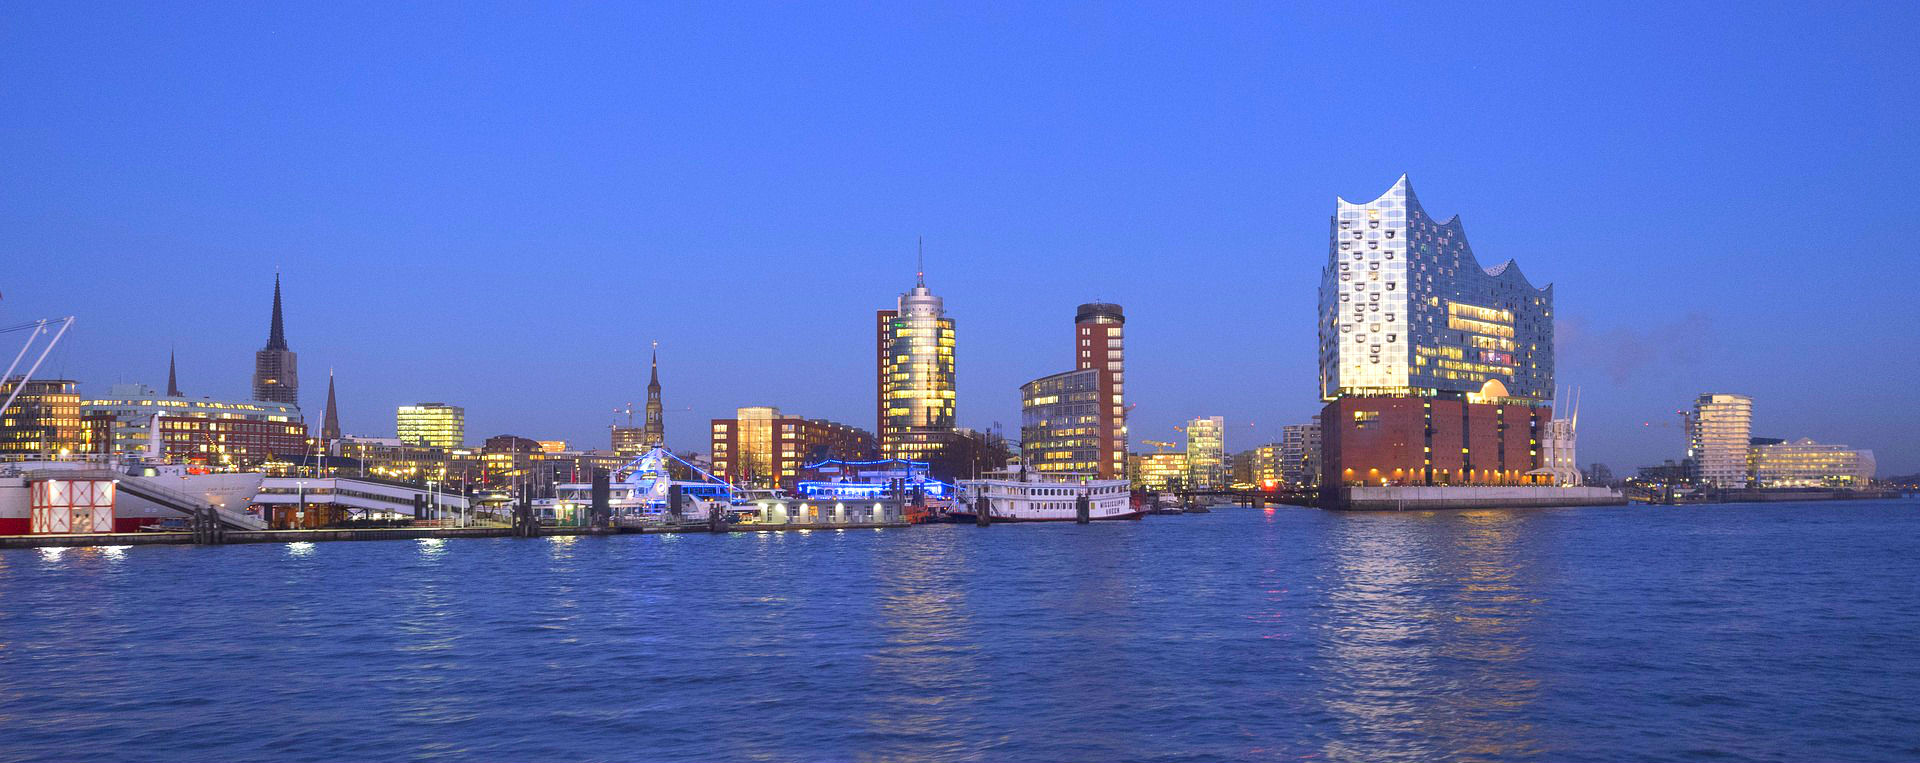 The Elbphilharmonie in Hamburg